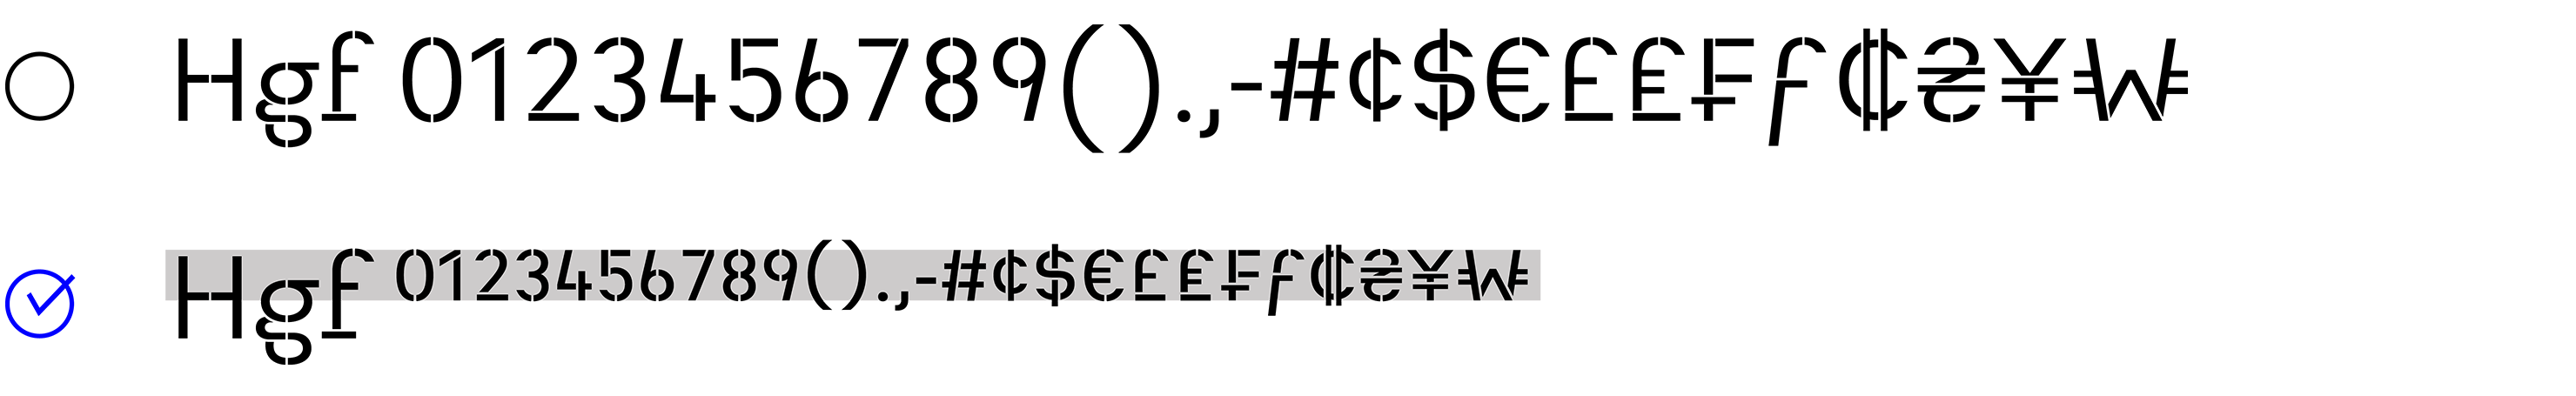 Typeface-Heimat-Stencil-F12-Atlas-Font-Foundry